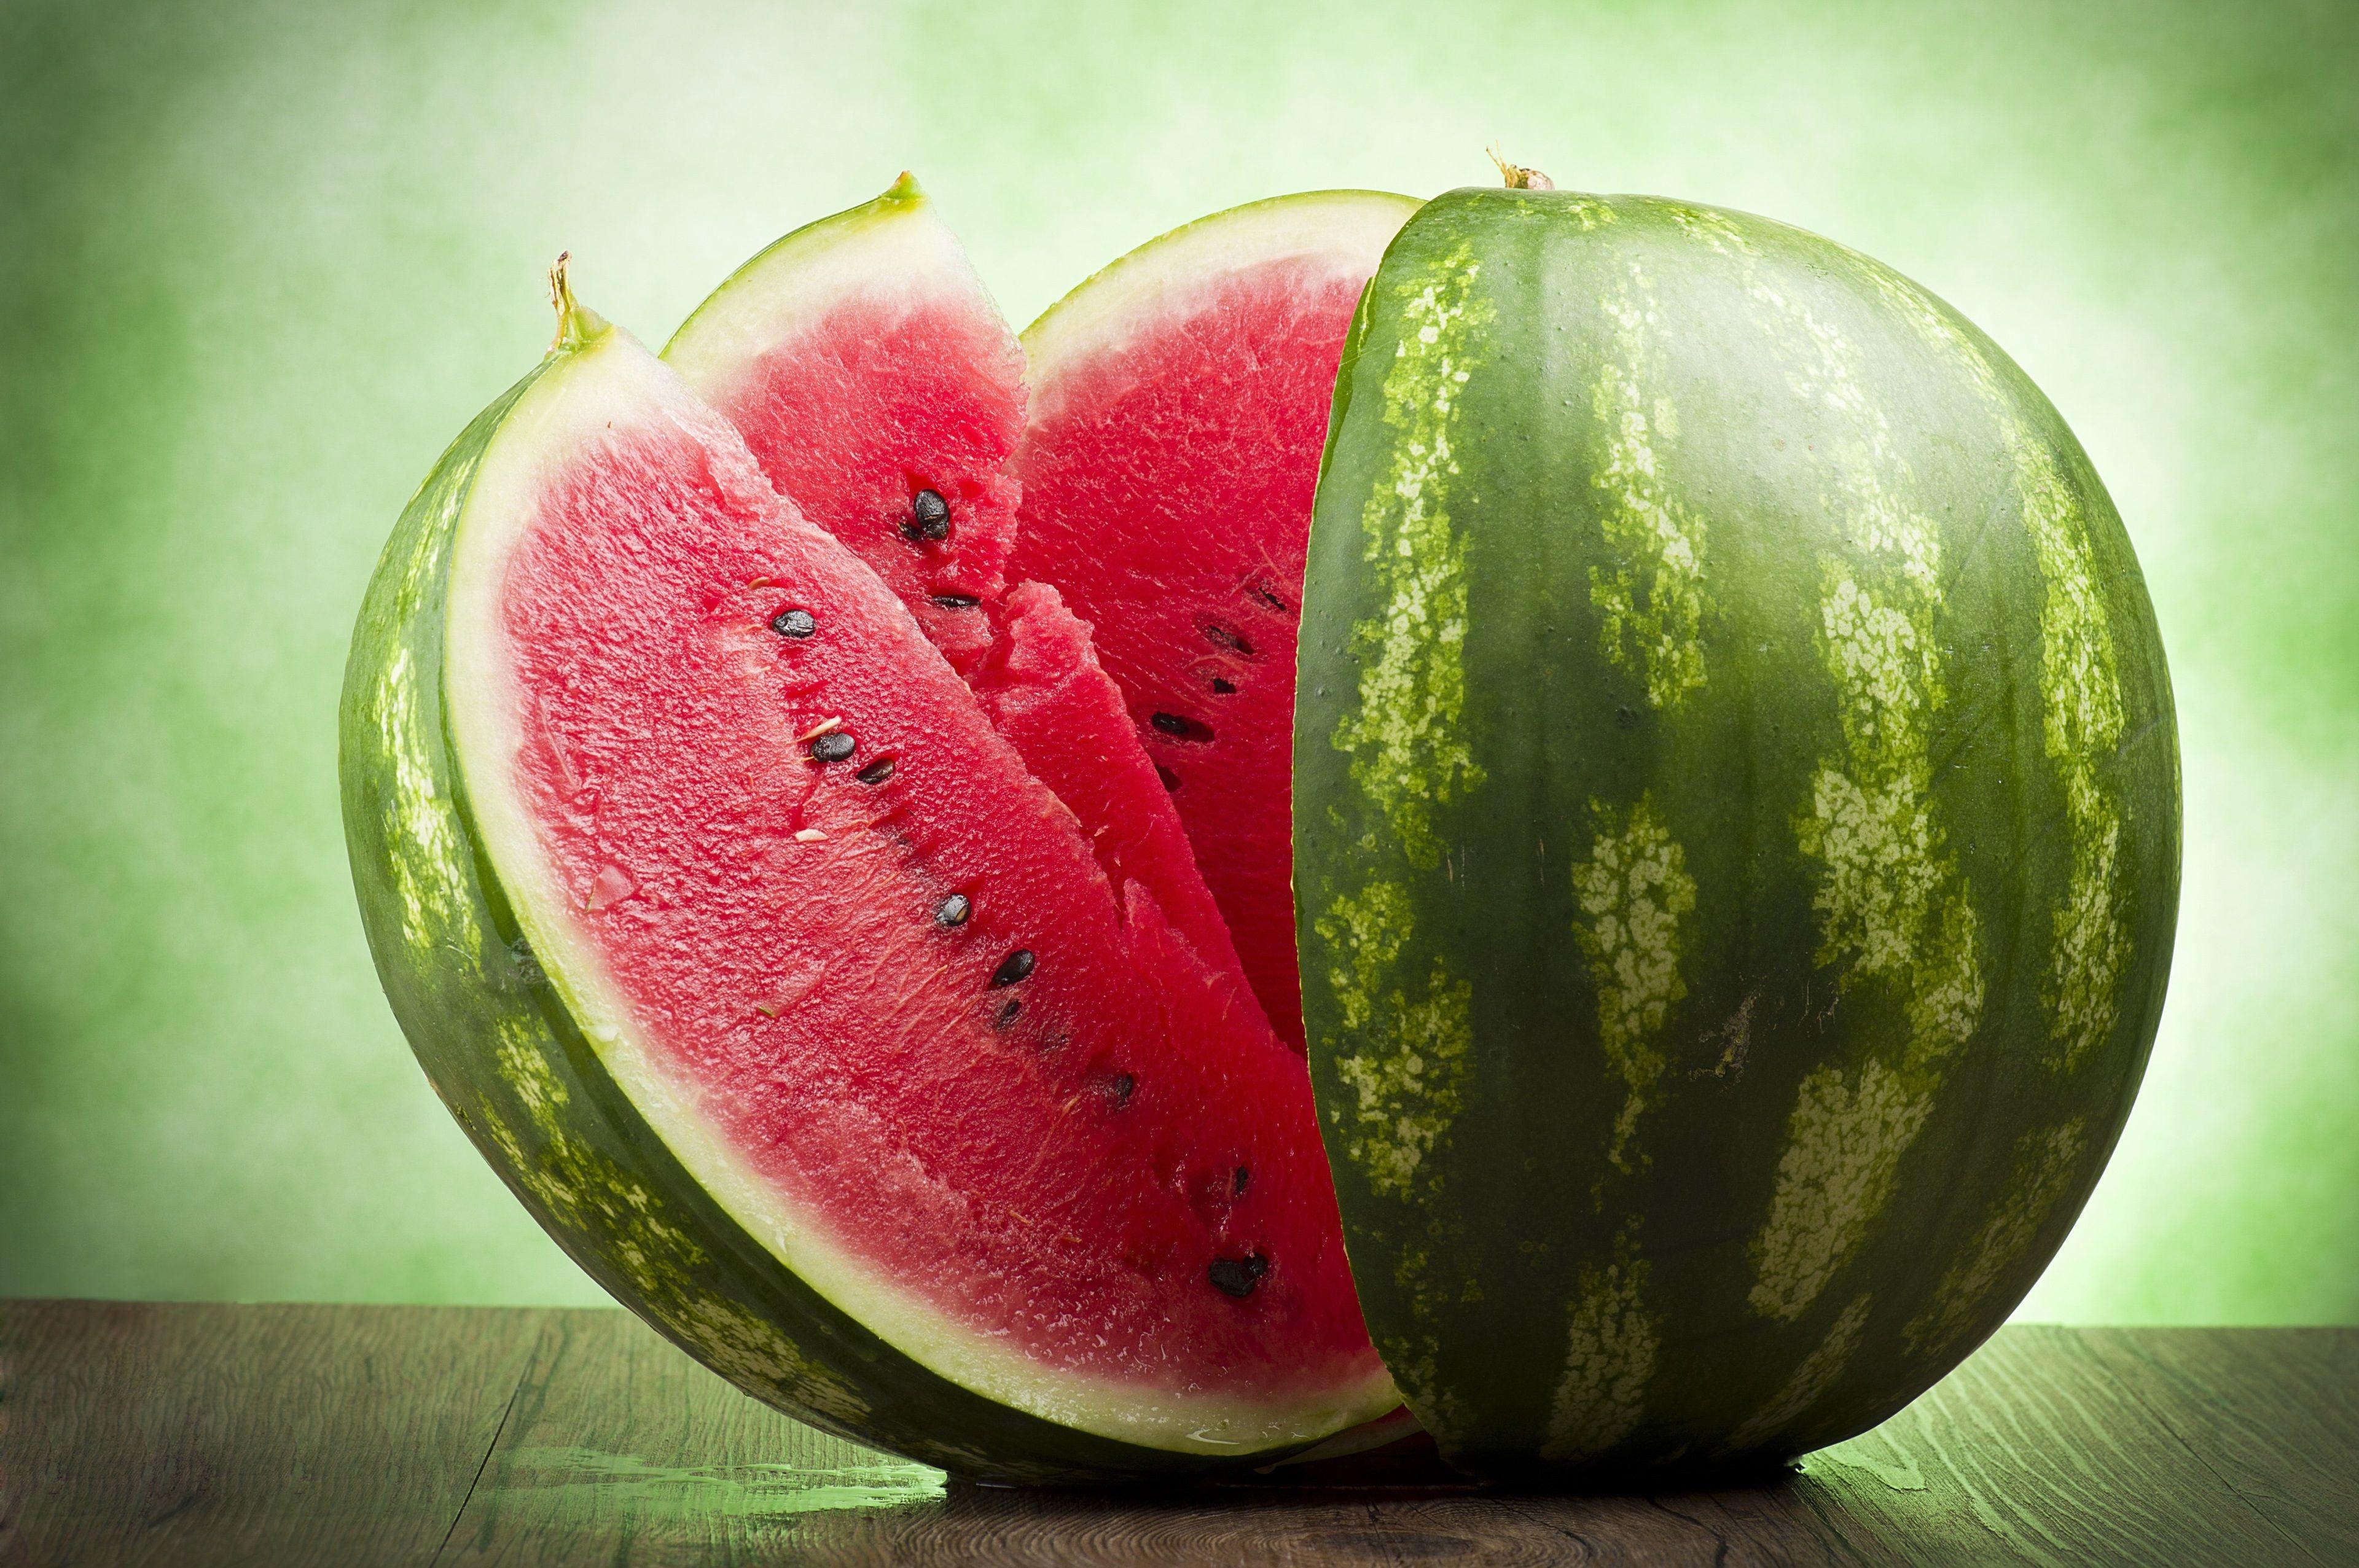 3840x2553 Watermelon 4k Free Download Of Desktop Wallpaper Fruit Picture Watermelon Watermelon Nutrition Facts